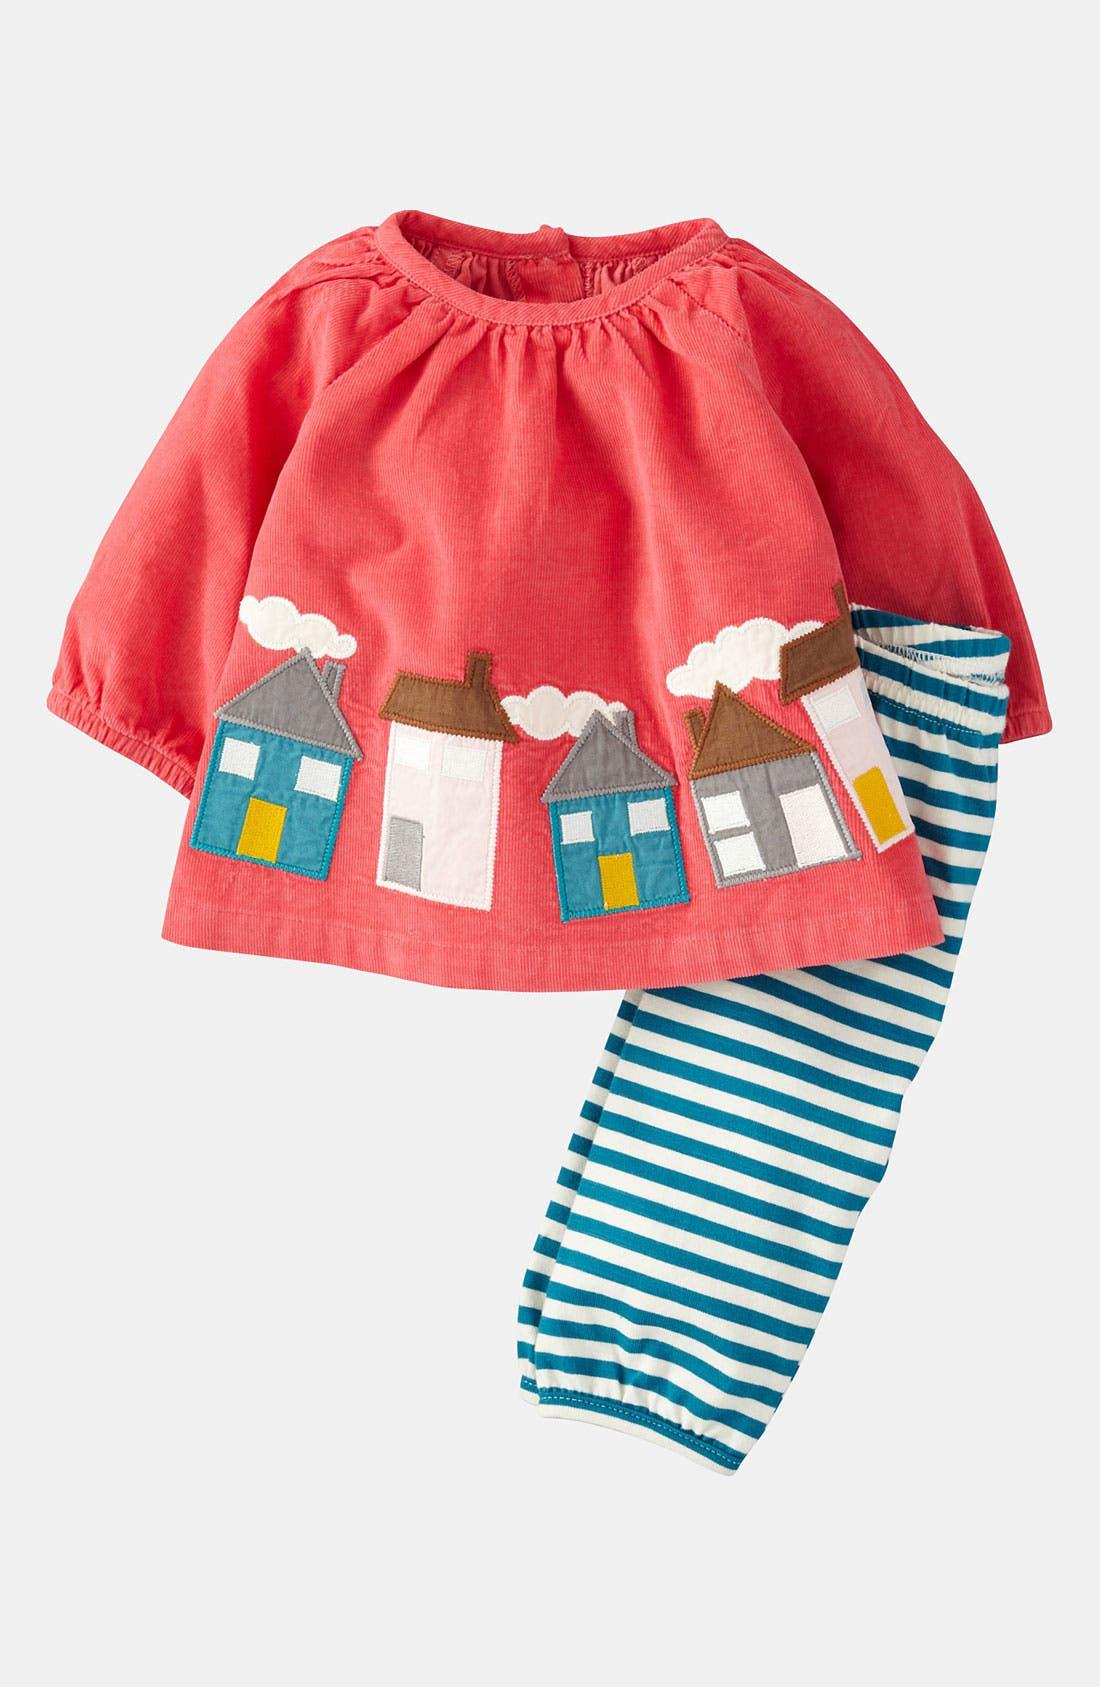 Main Image - Mini Boden Appliqué Shirt & Leggings (Infant)